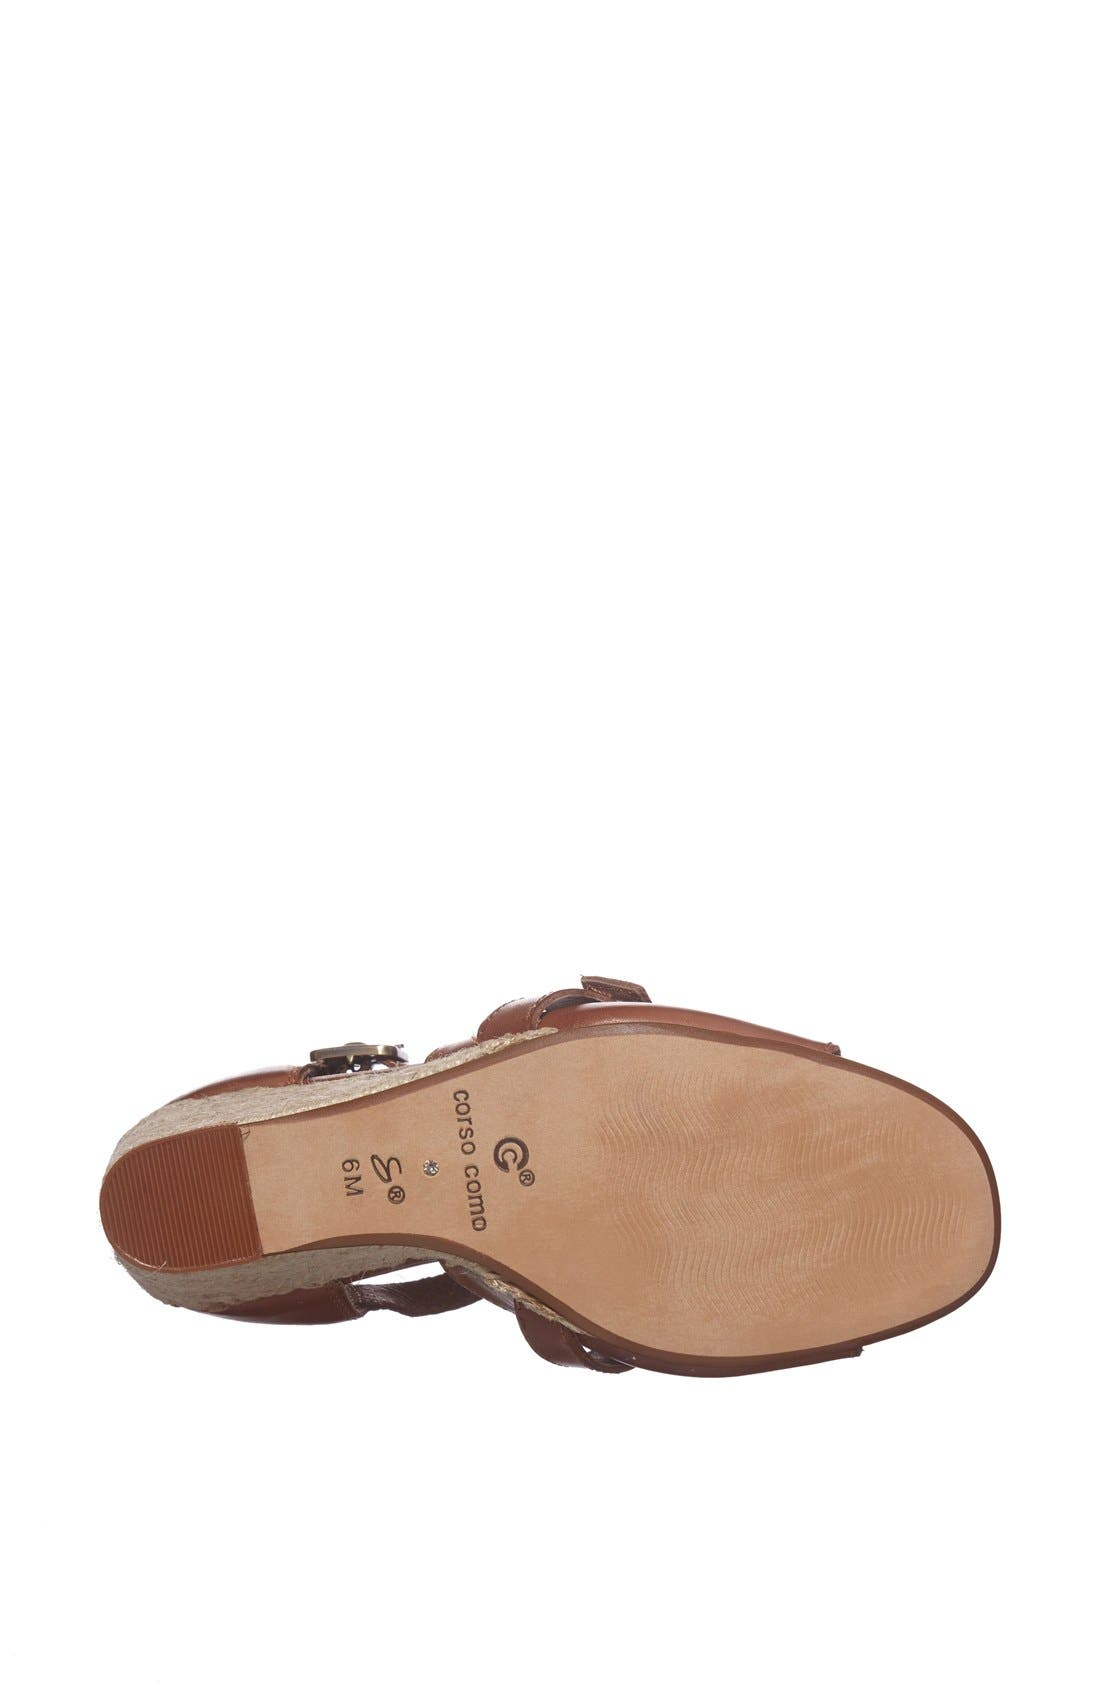 Alternate Image 4  - Corso Como 'Hello' Calfskin Leather Sandal